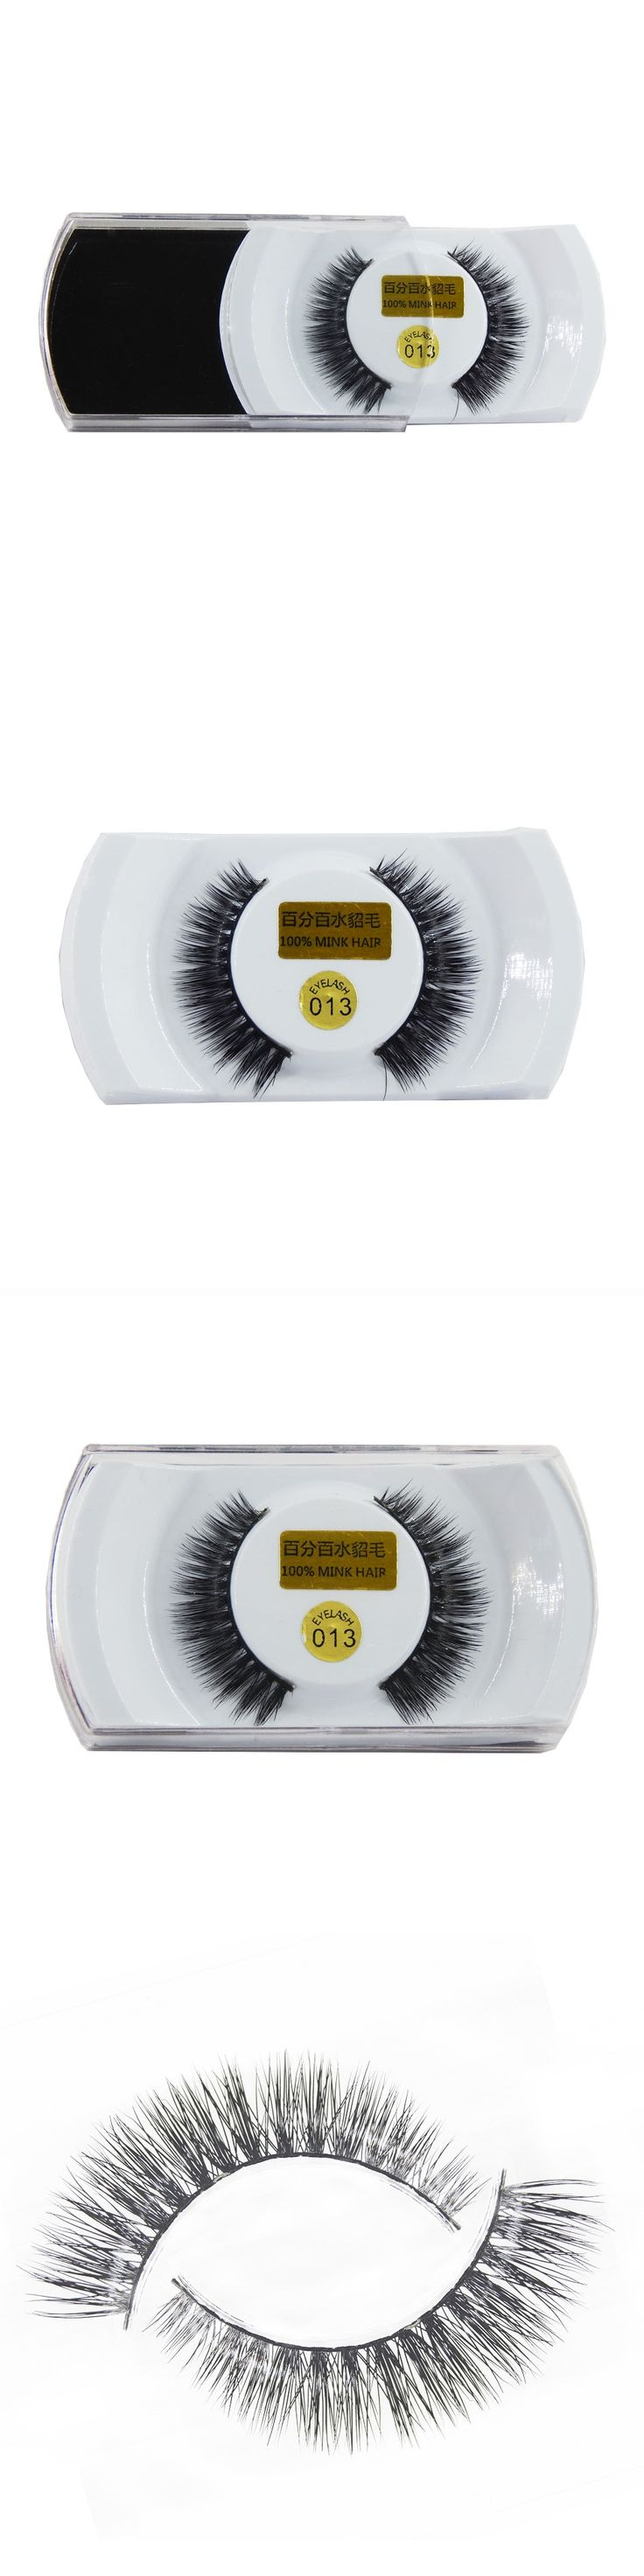 1 Pair Handmade Winged Mink False Eyelashes Popular Super Long Thick Eyelash for Beauty Makeup-EMH013